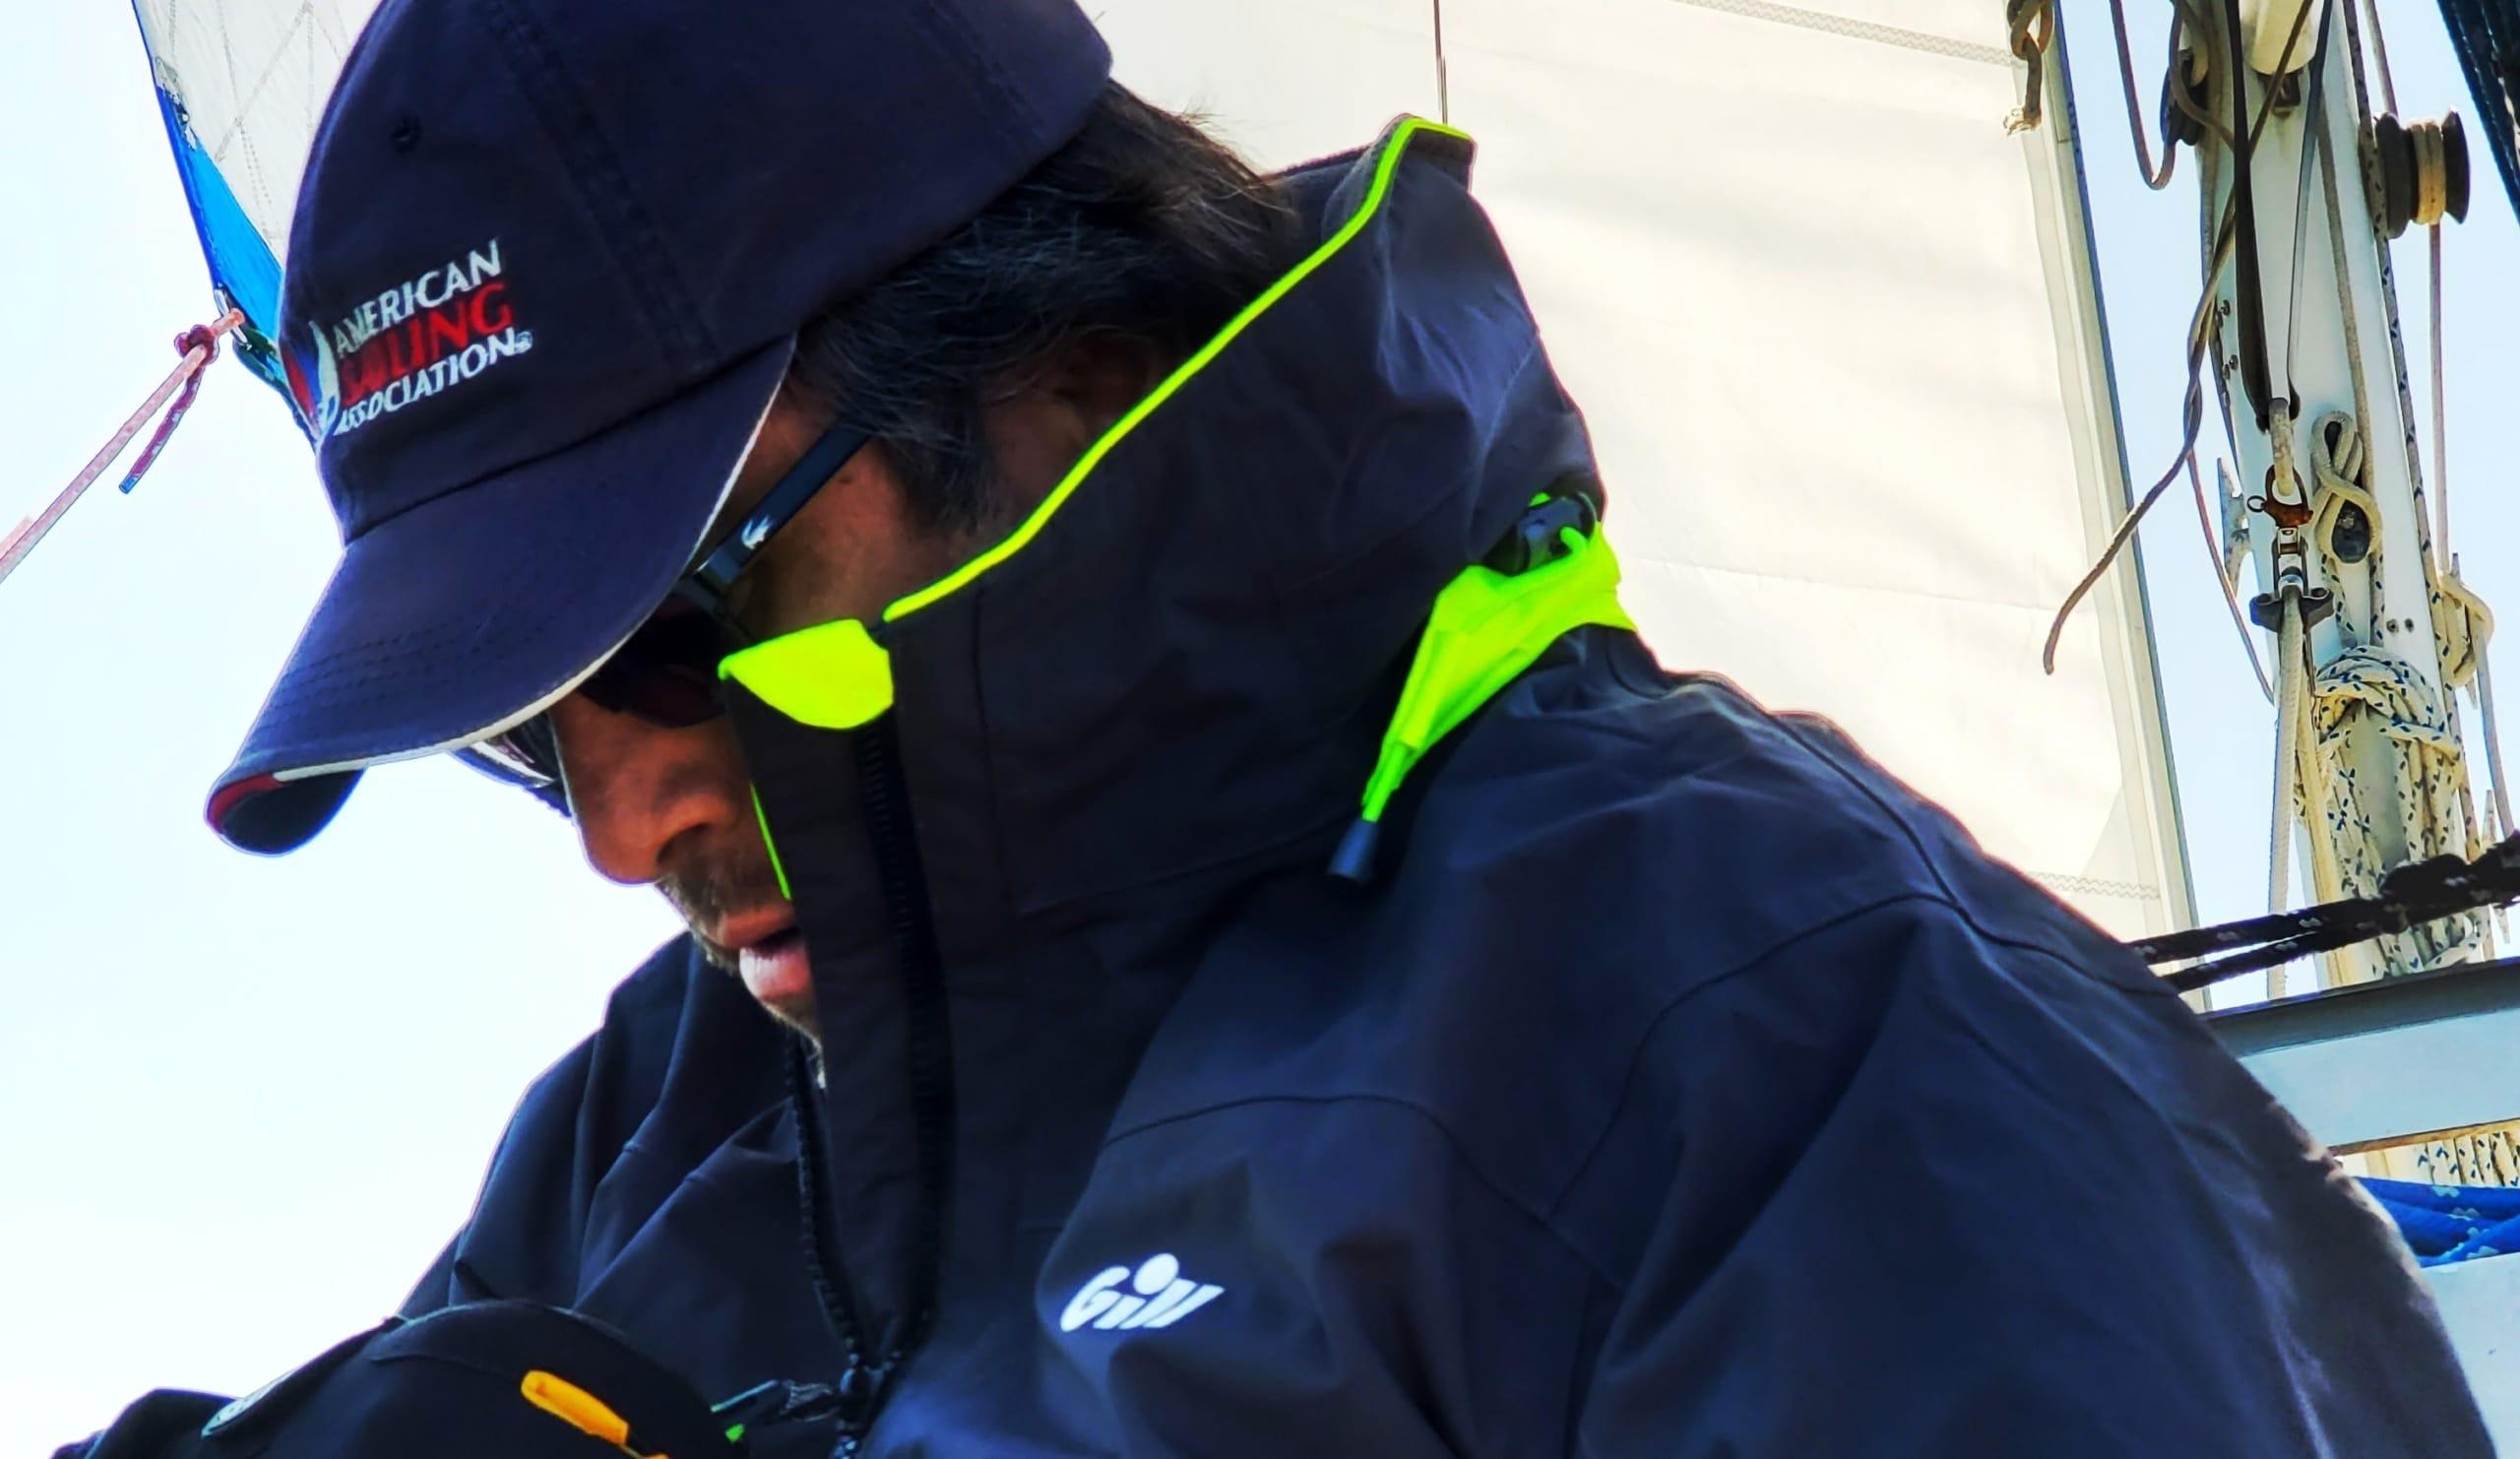 Product Review: Gill Marine Coastal Jacket - American Sailing Association